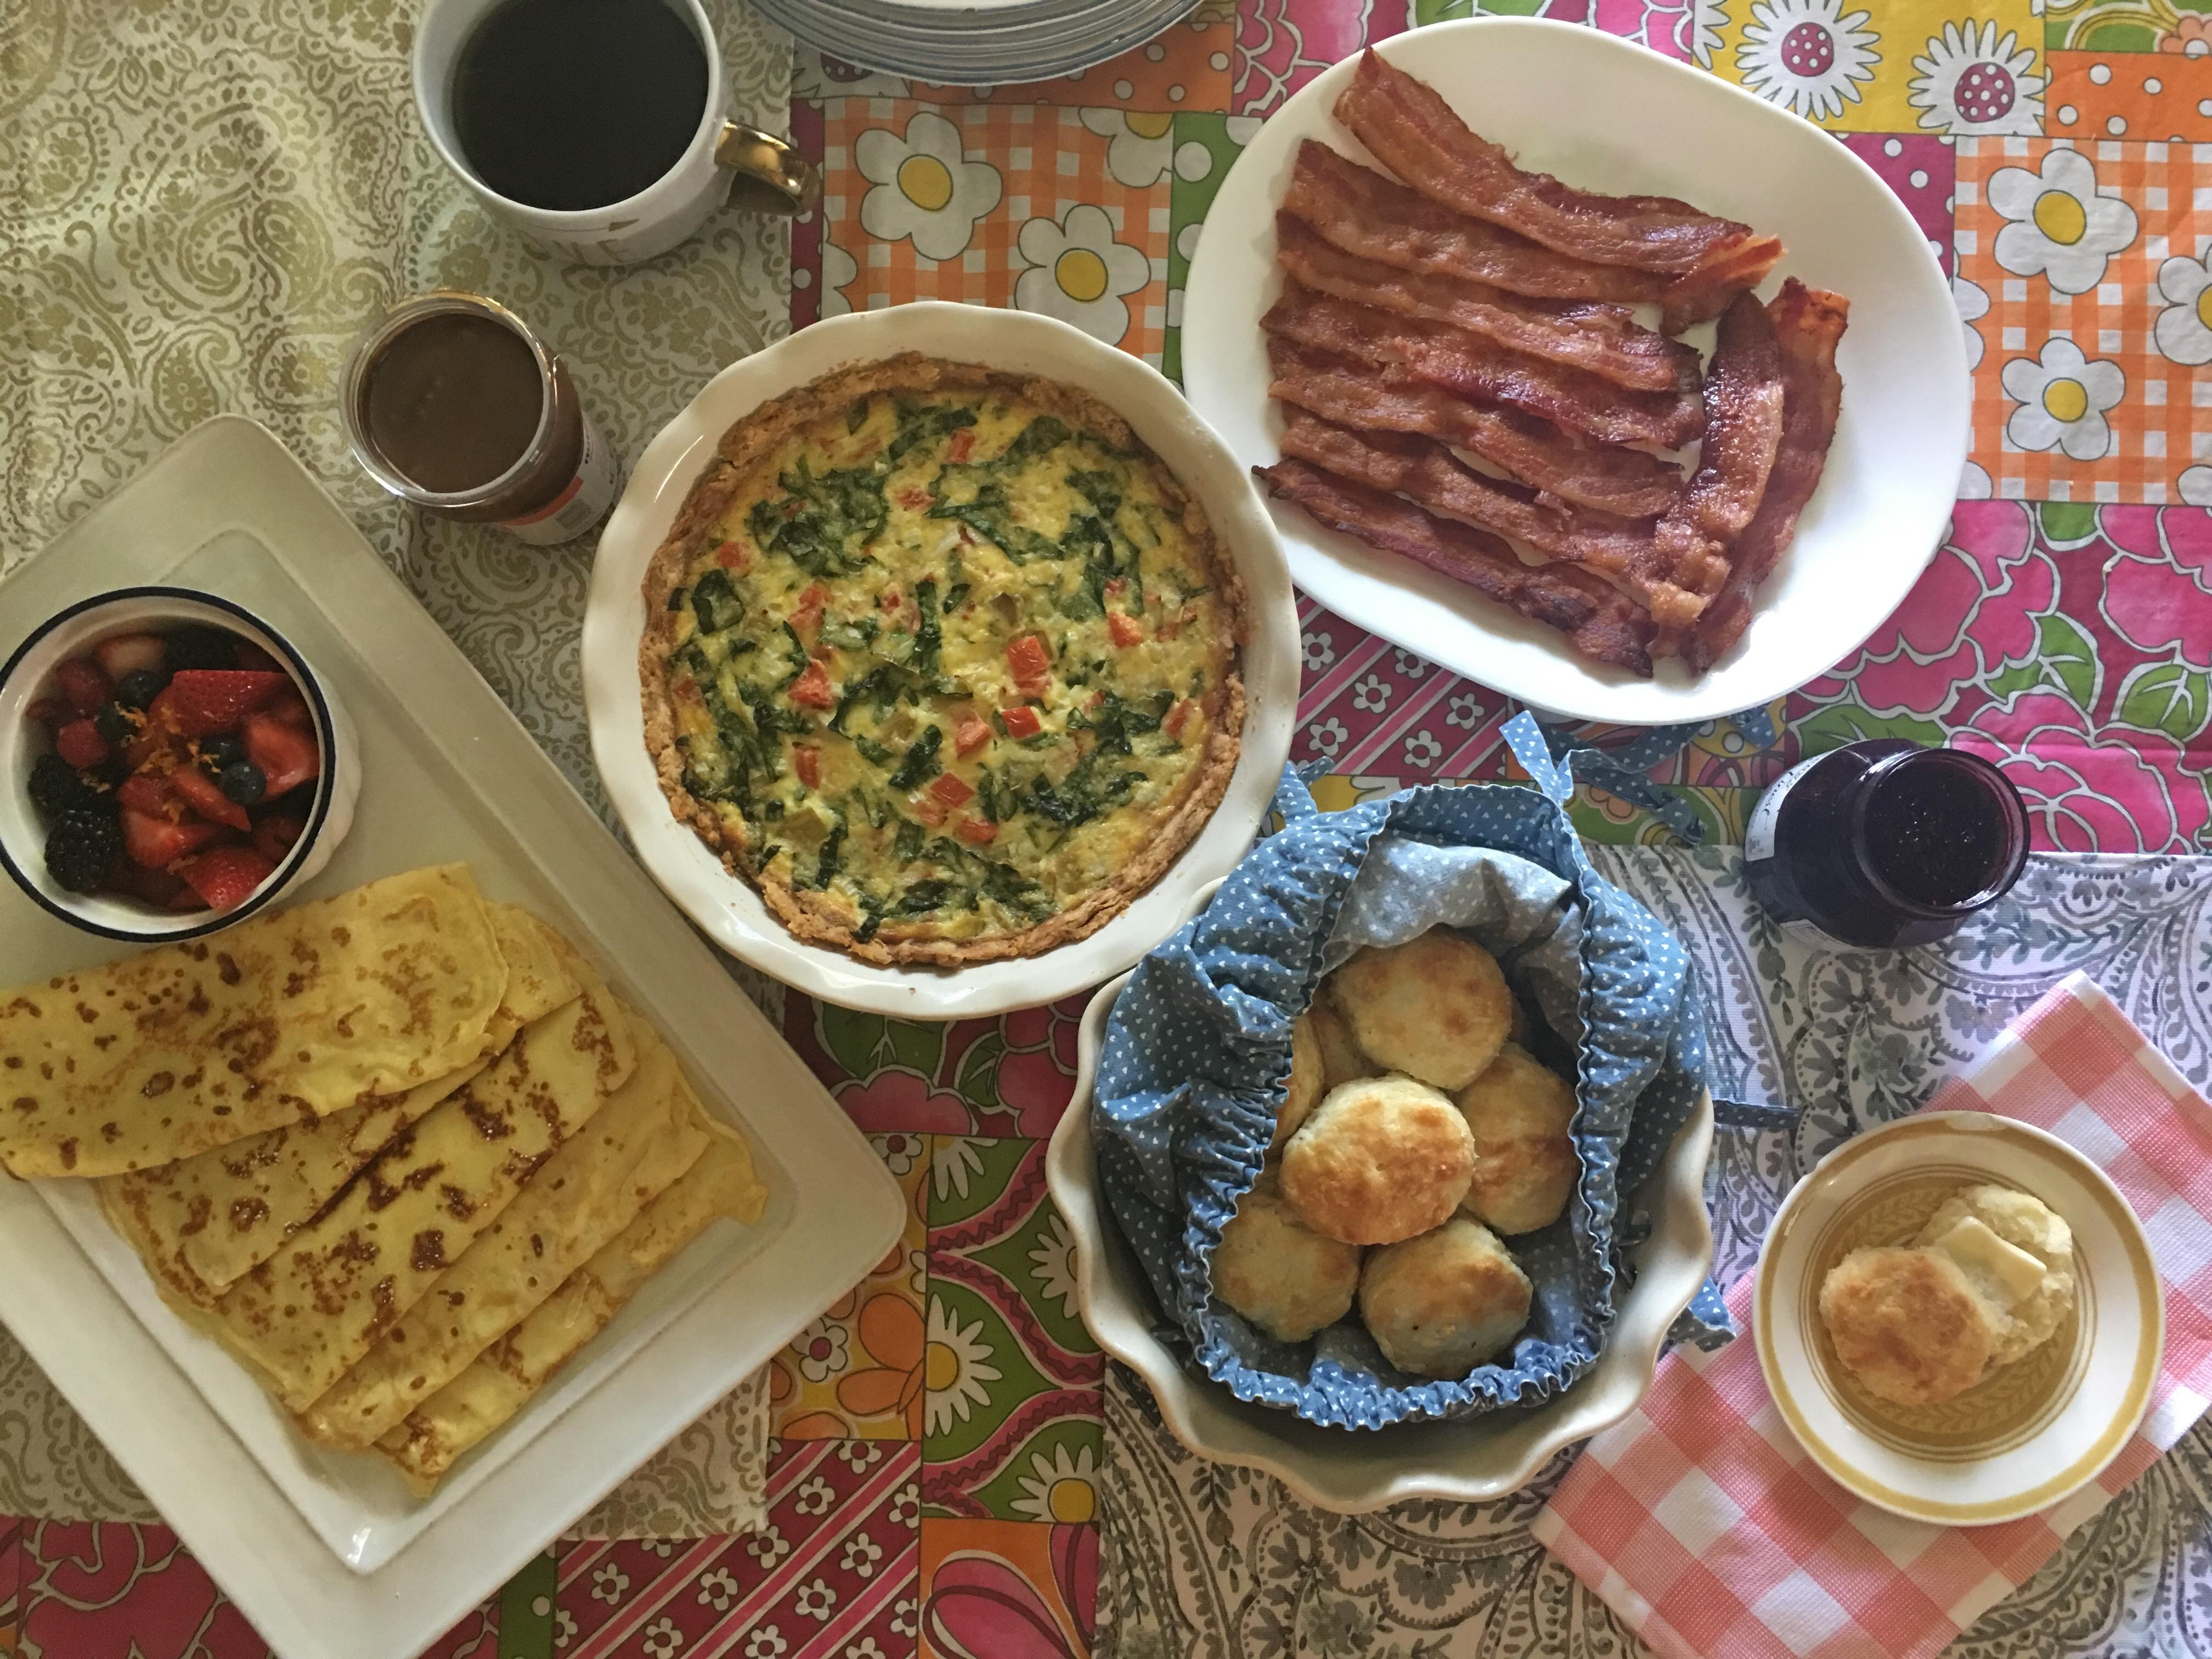 Sunday # 9: Mother's Day Brunch